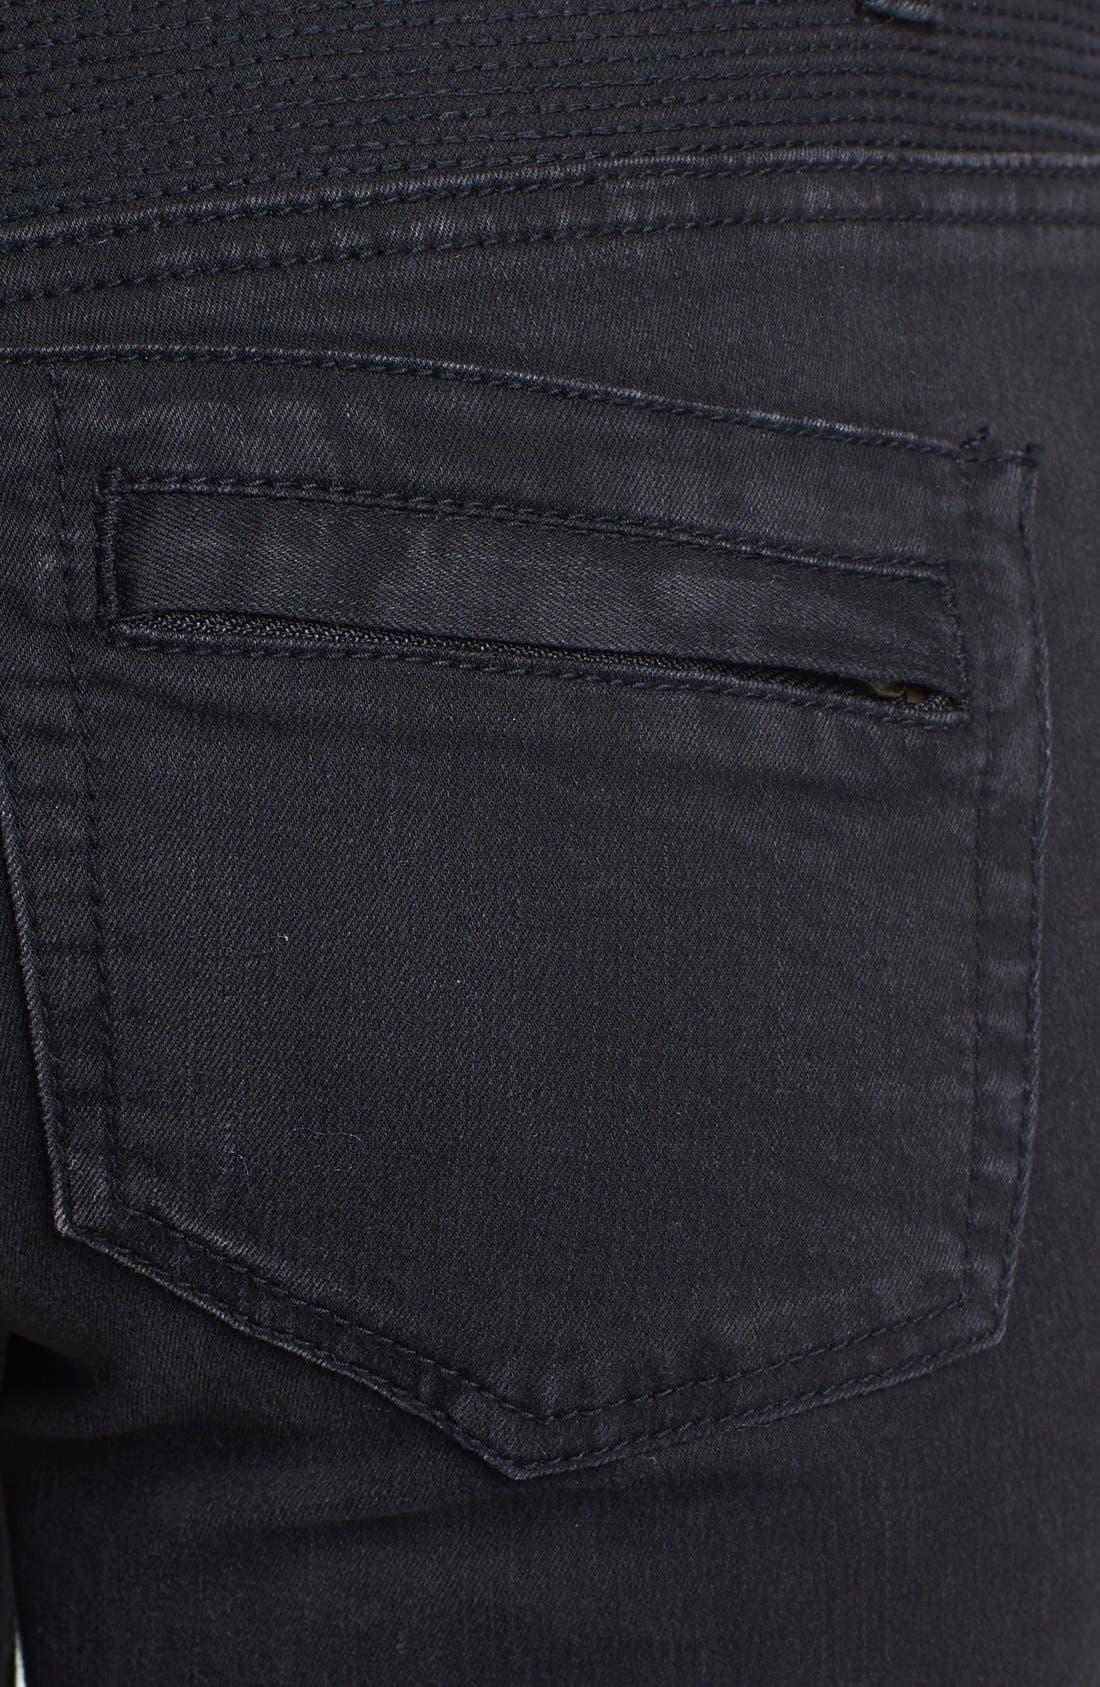 Alternate Image 3  - Free People Seamed Moto Skinny Jeans (Moonlight)